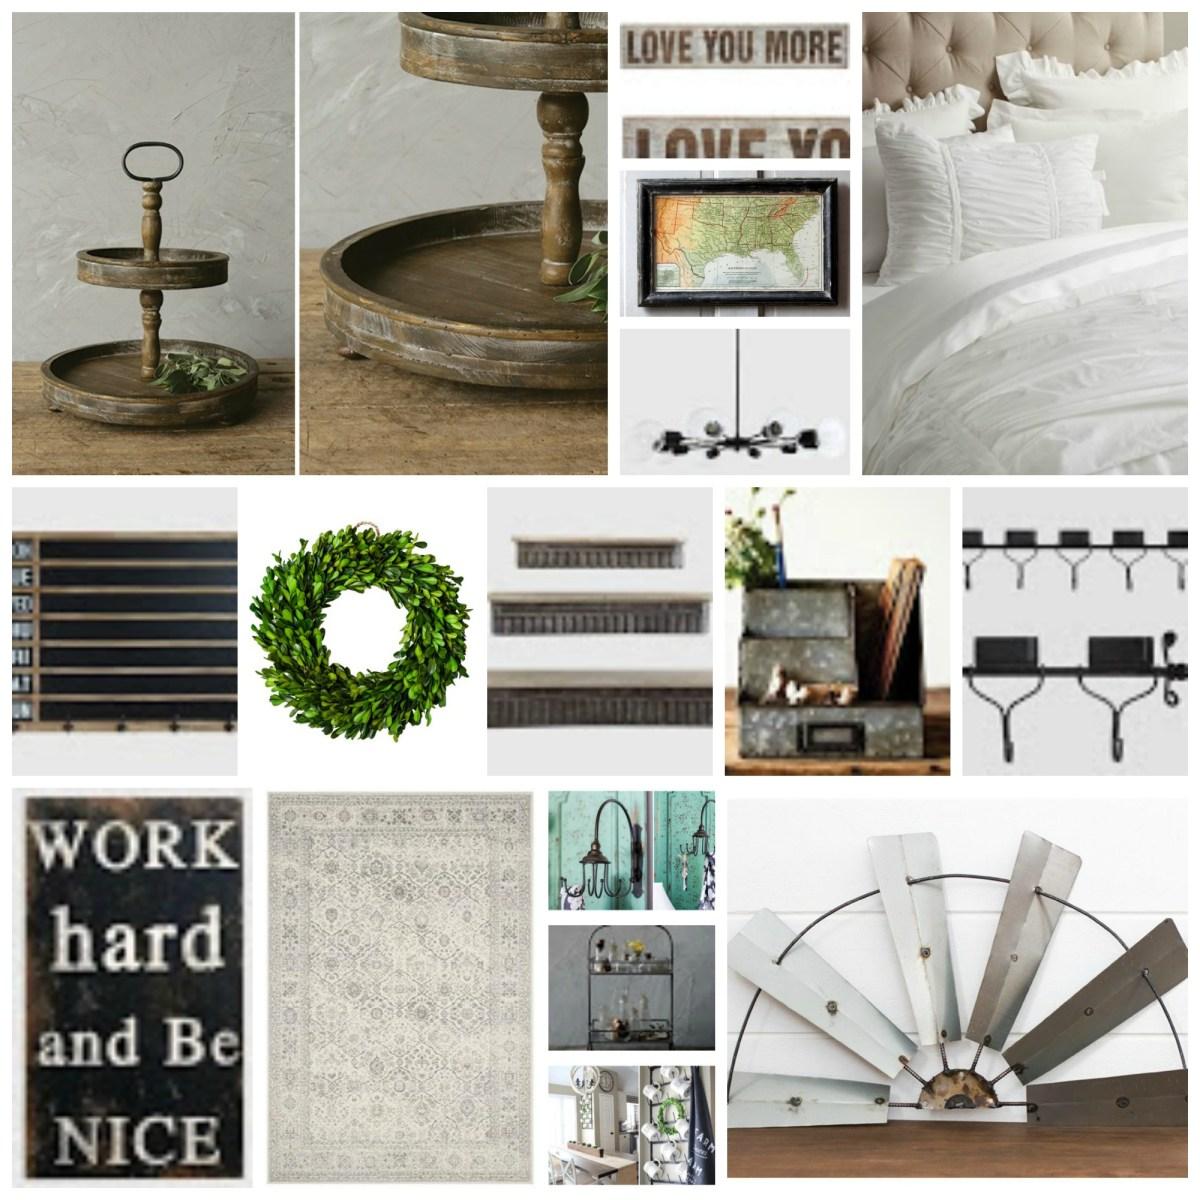 Home Decor Daily Deals: Tuesday, January 24, 2017